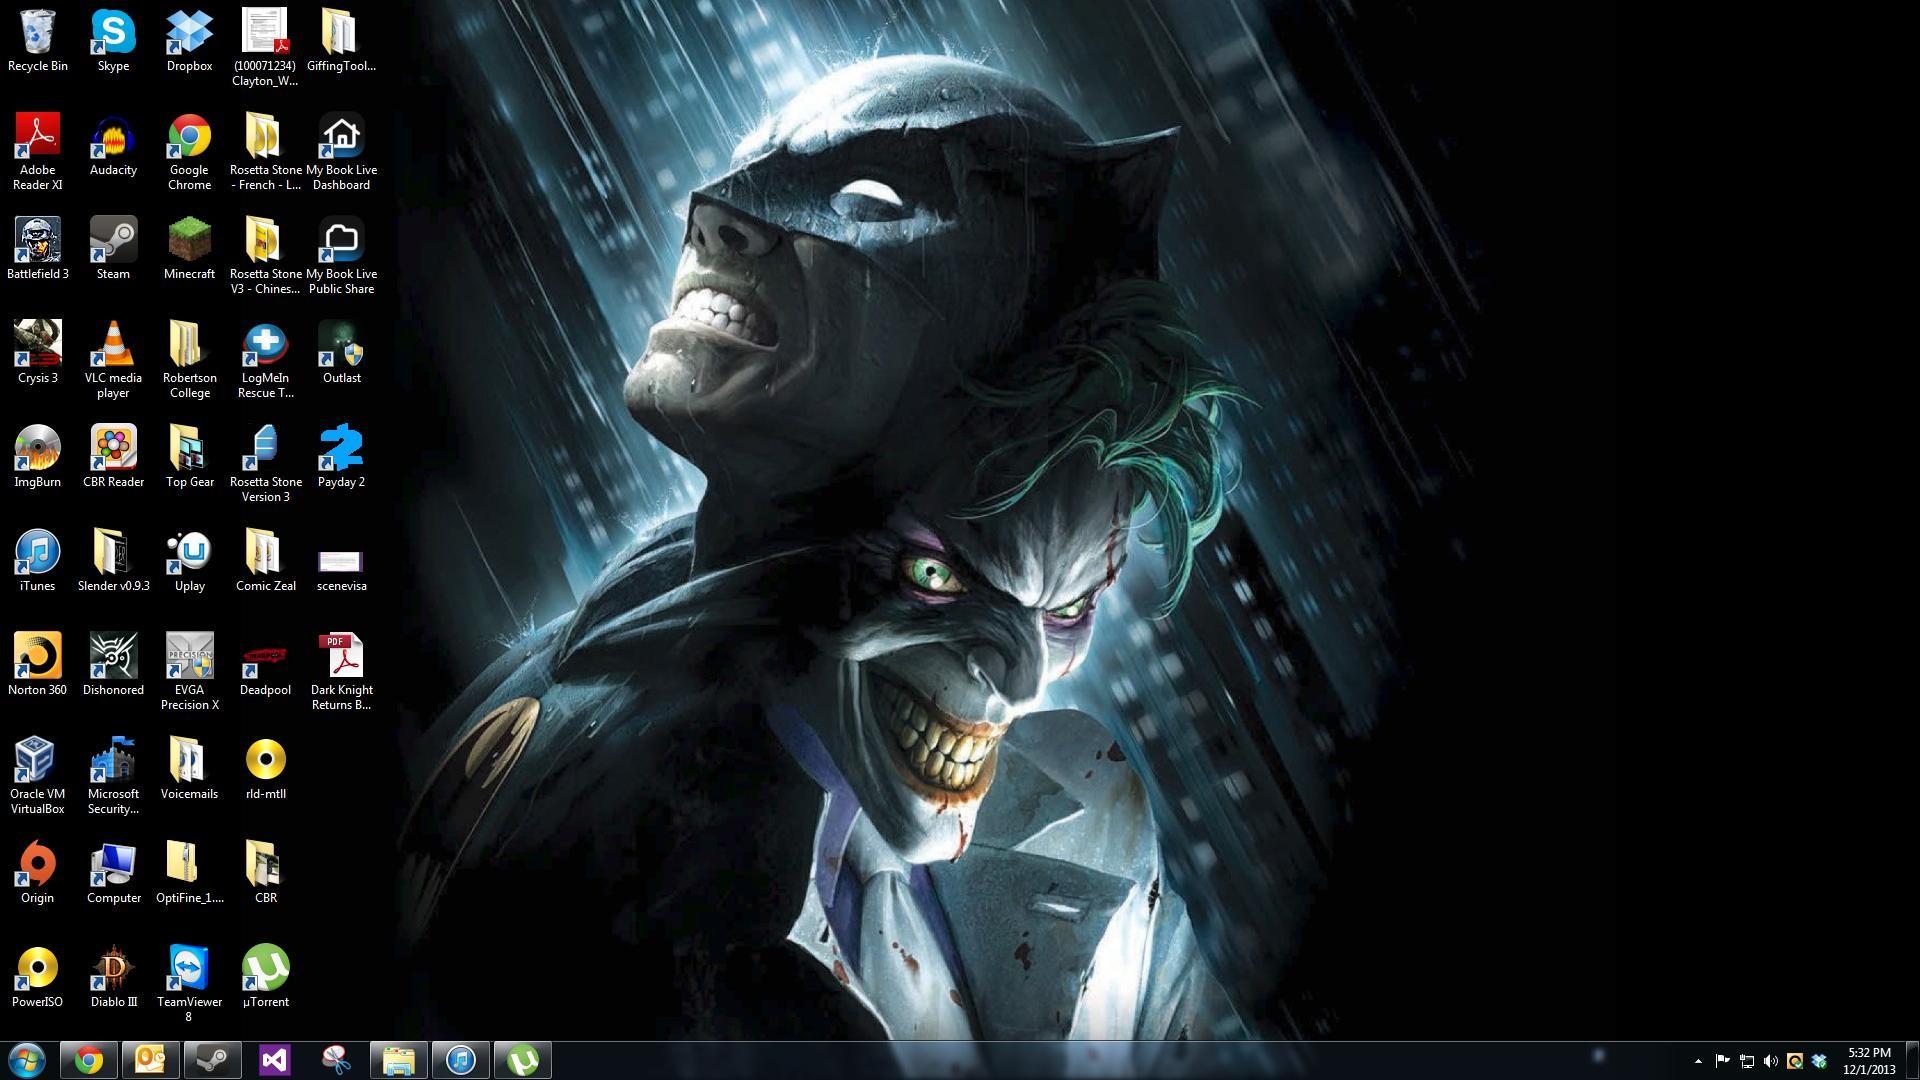 My new desktop background, from The Dark Knight Returns OST .